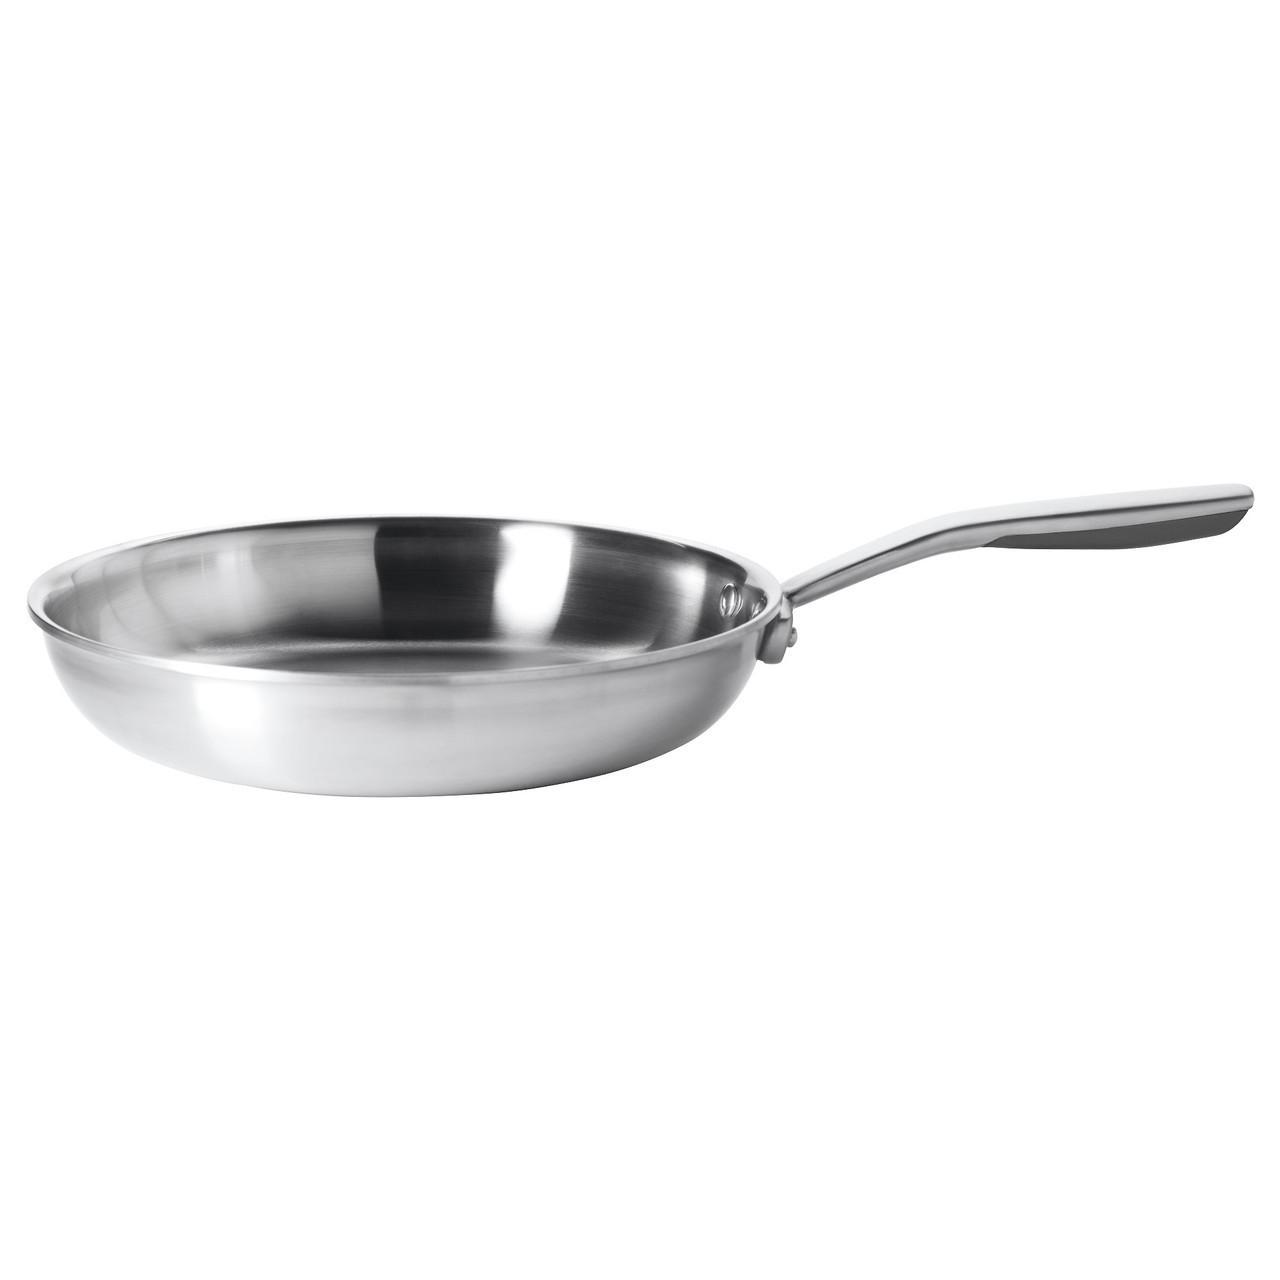 SENSUELL Сковорода, нержавеющ сталь, серый 603.245.44